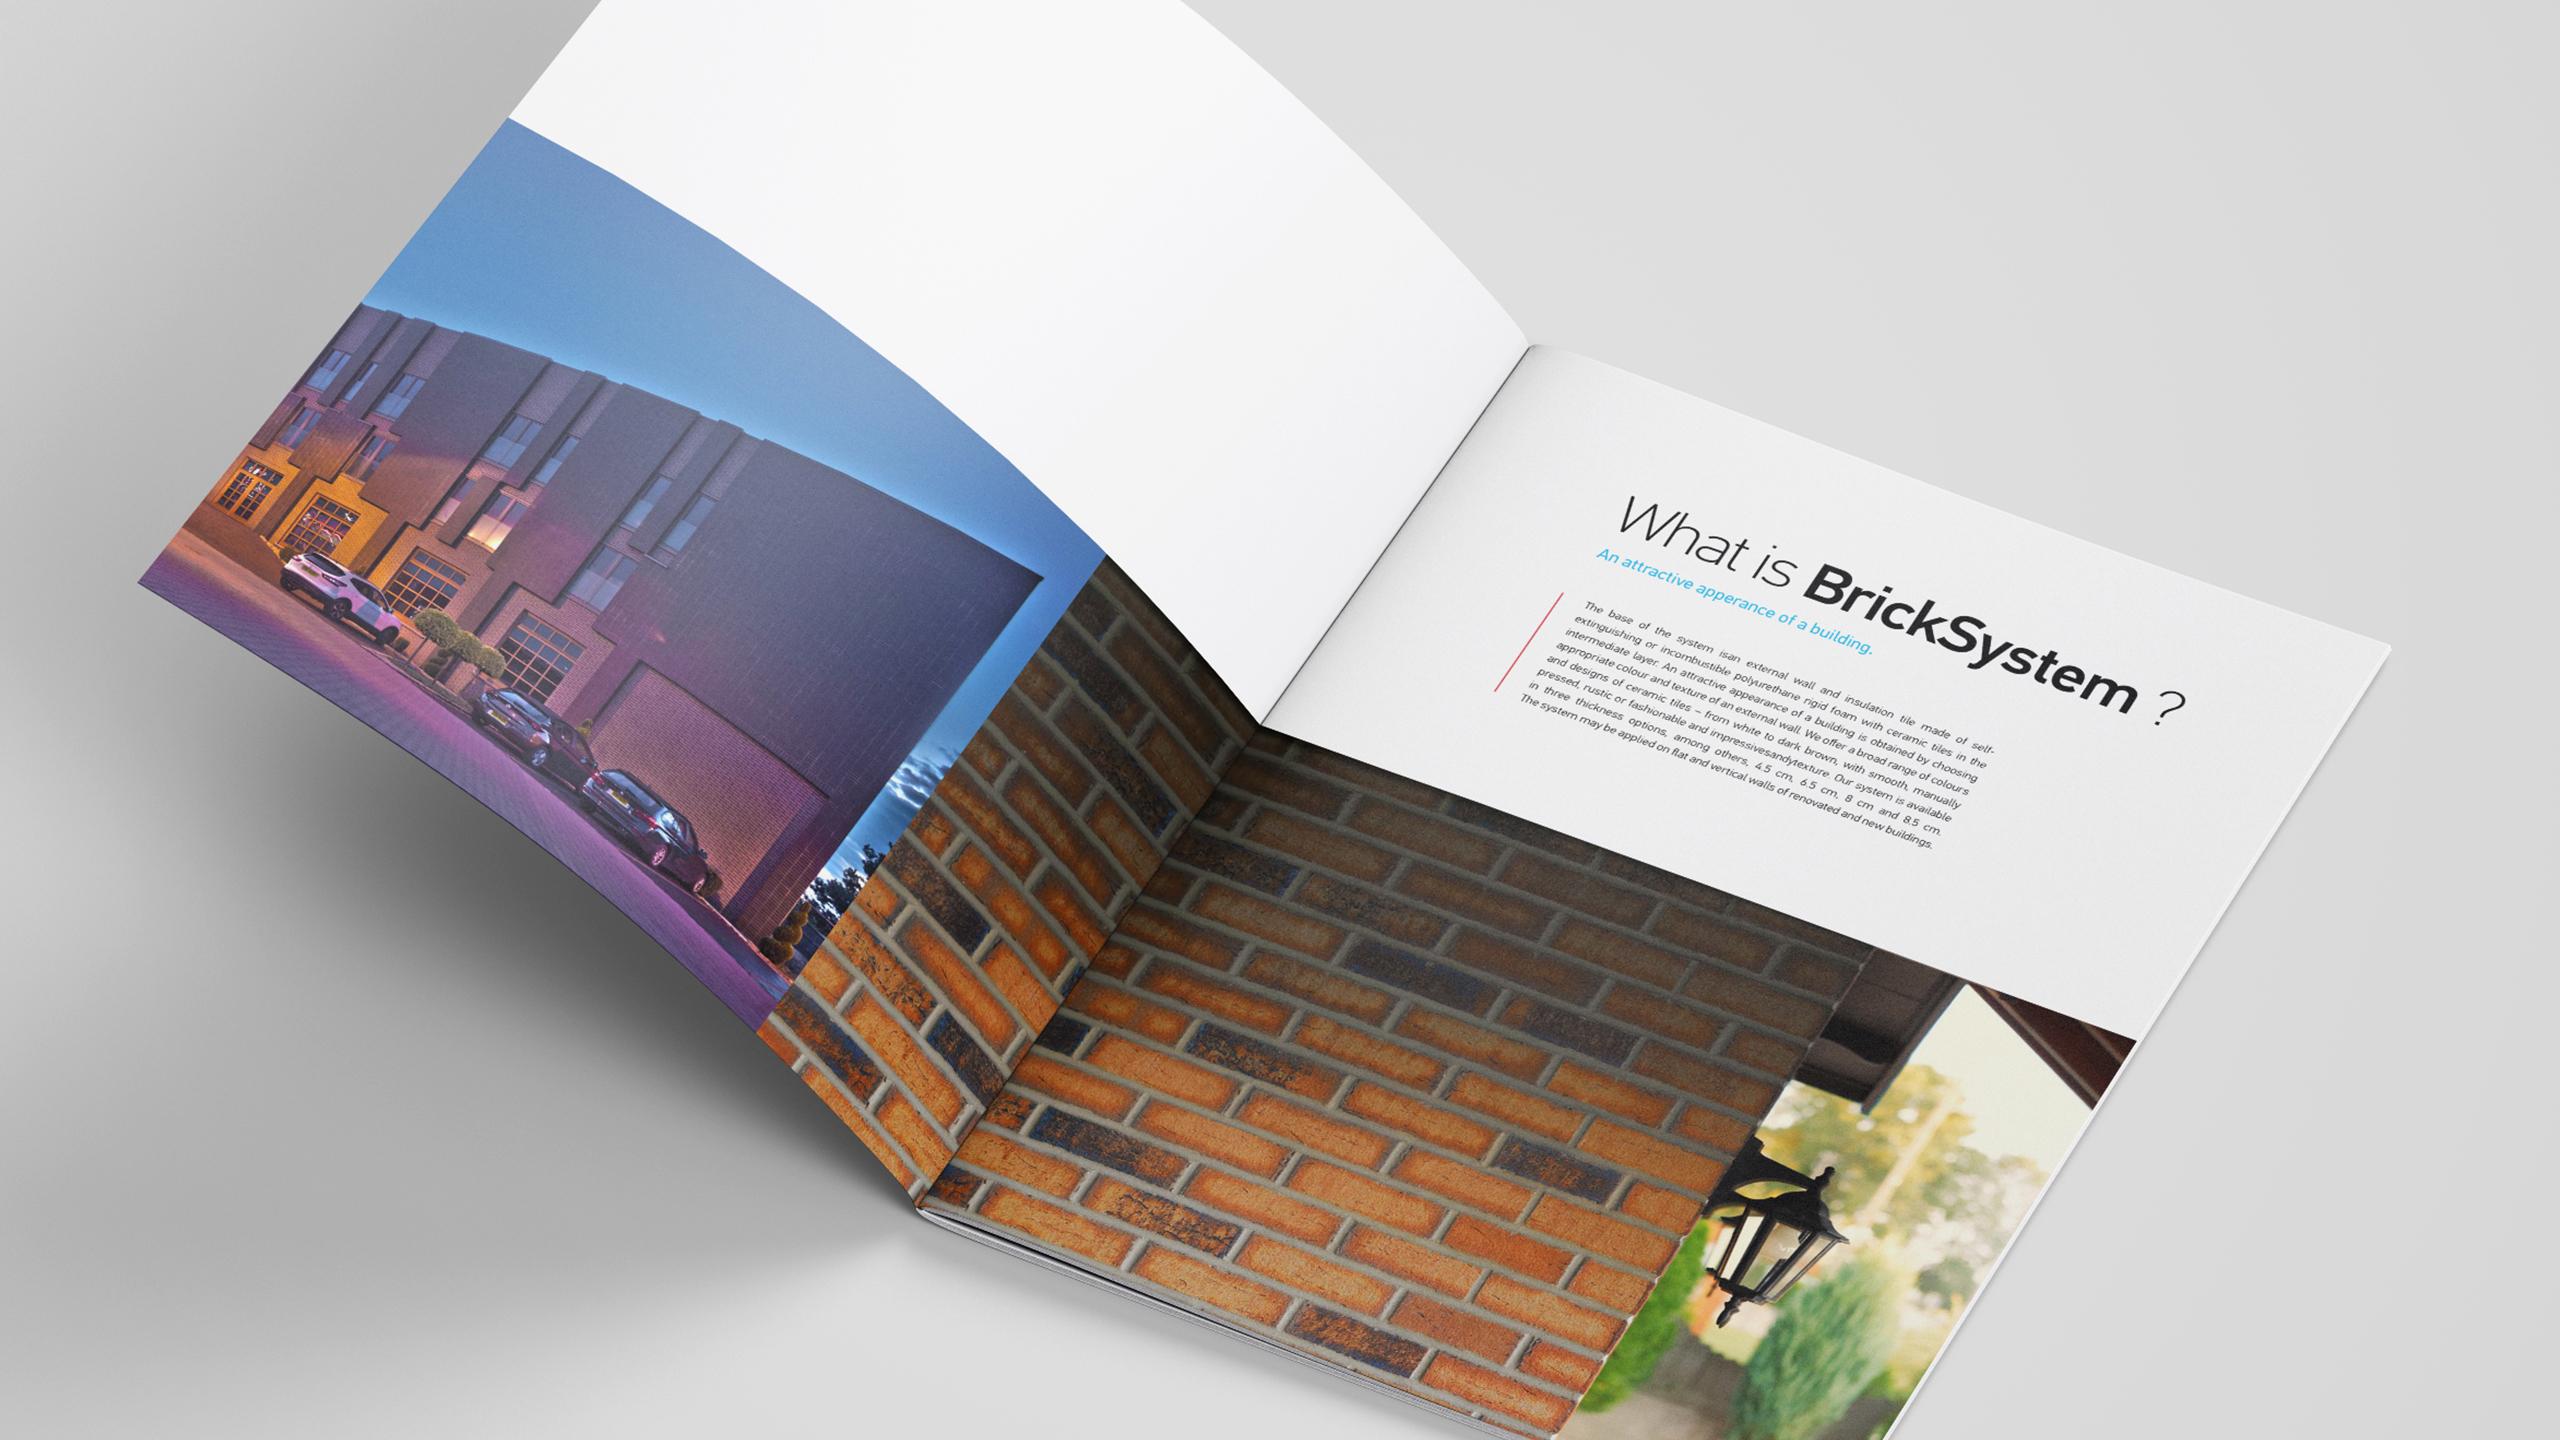 Brick System